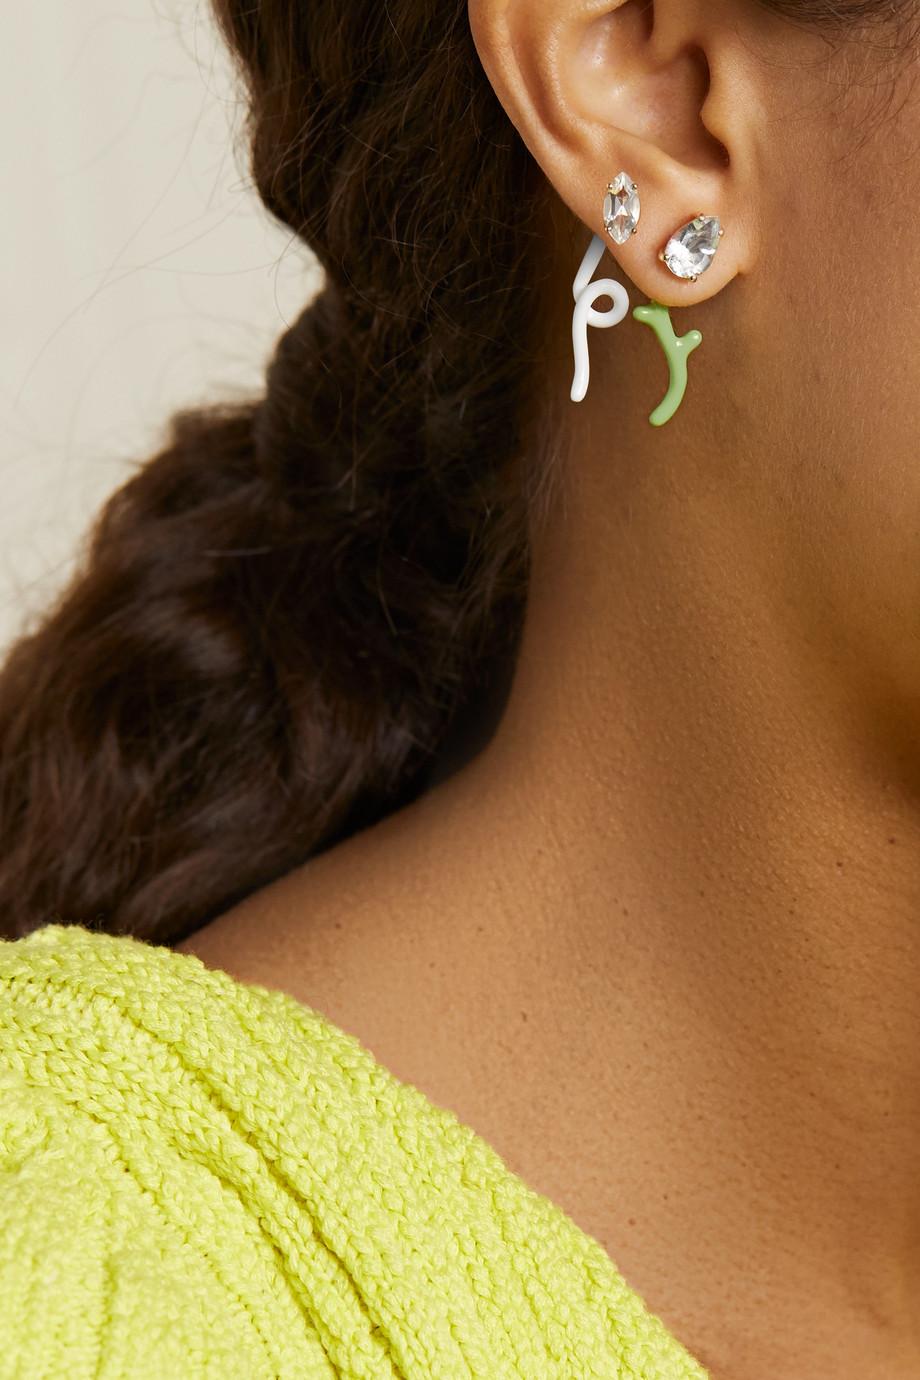 Bea Bongiasca Foxy 9-karat gold, silver, enamel and rock crystal earring